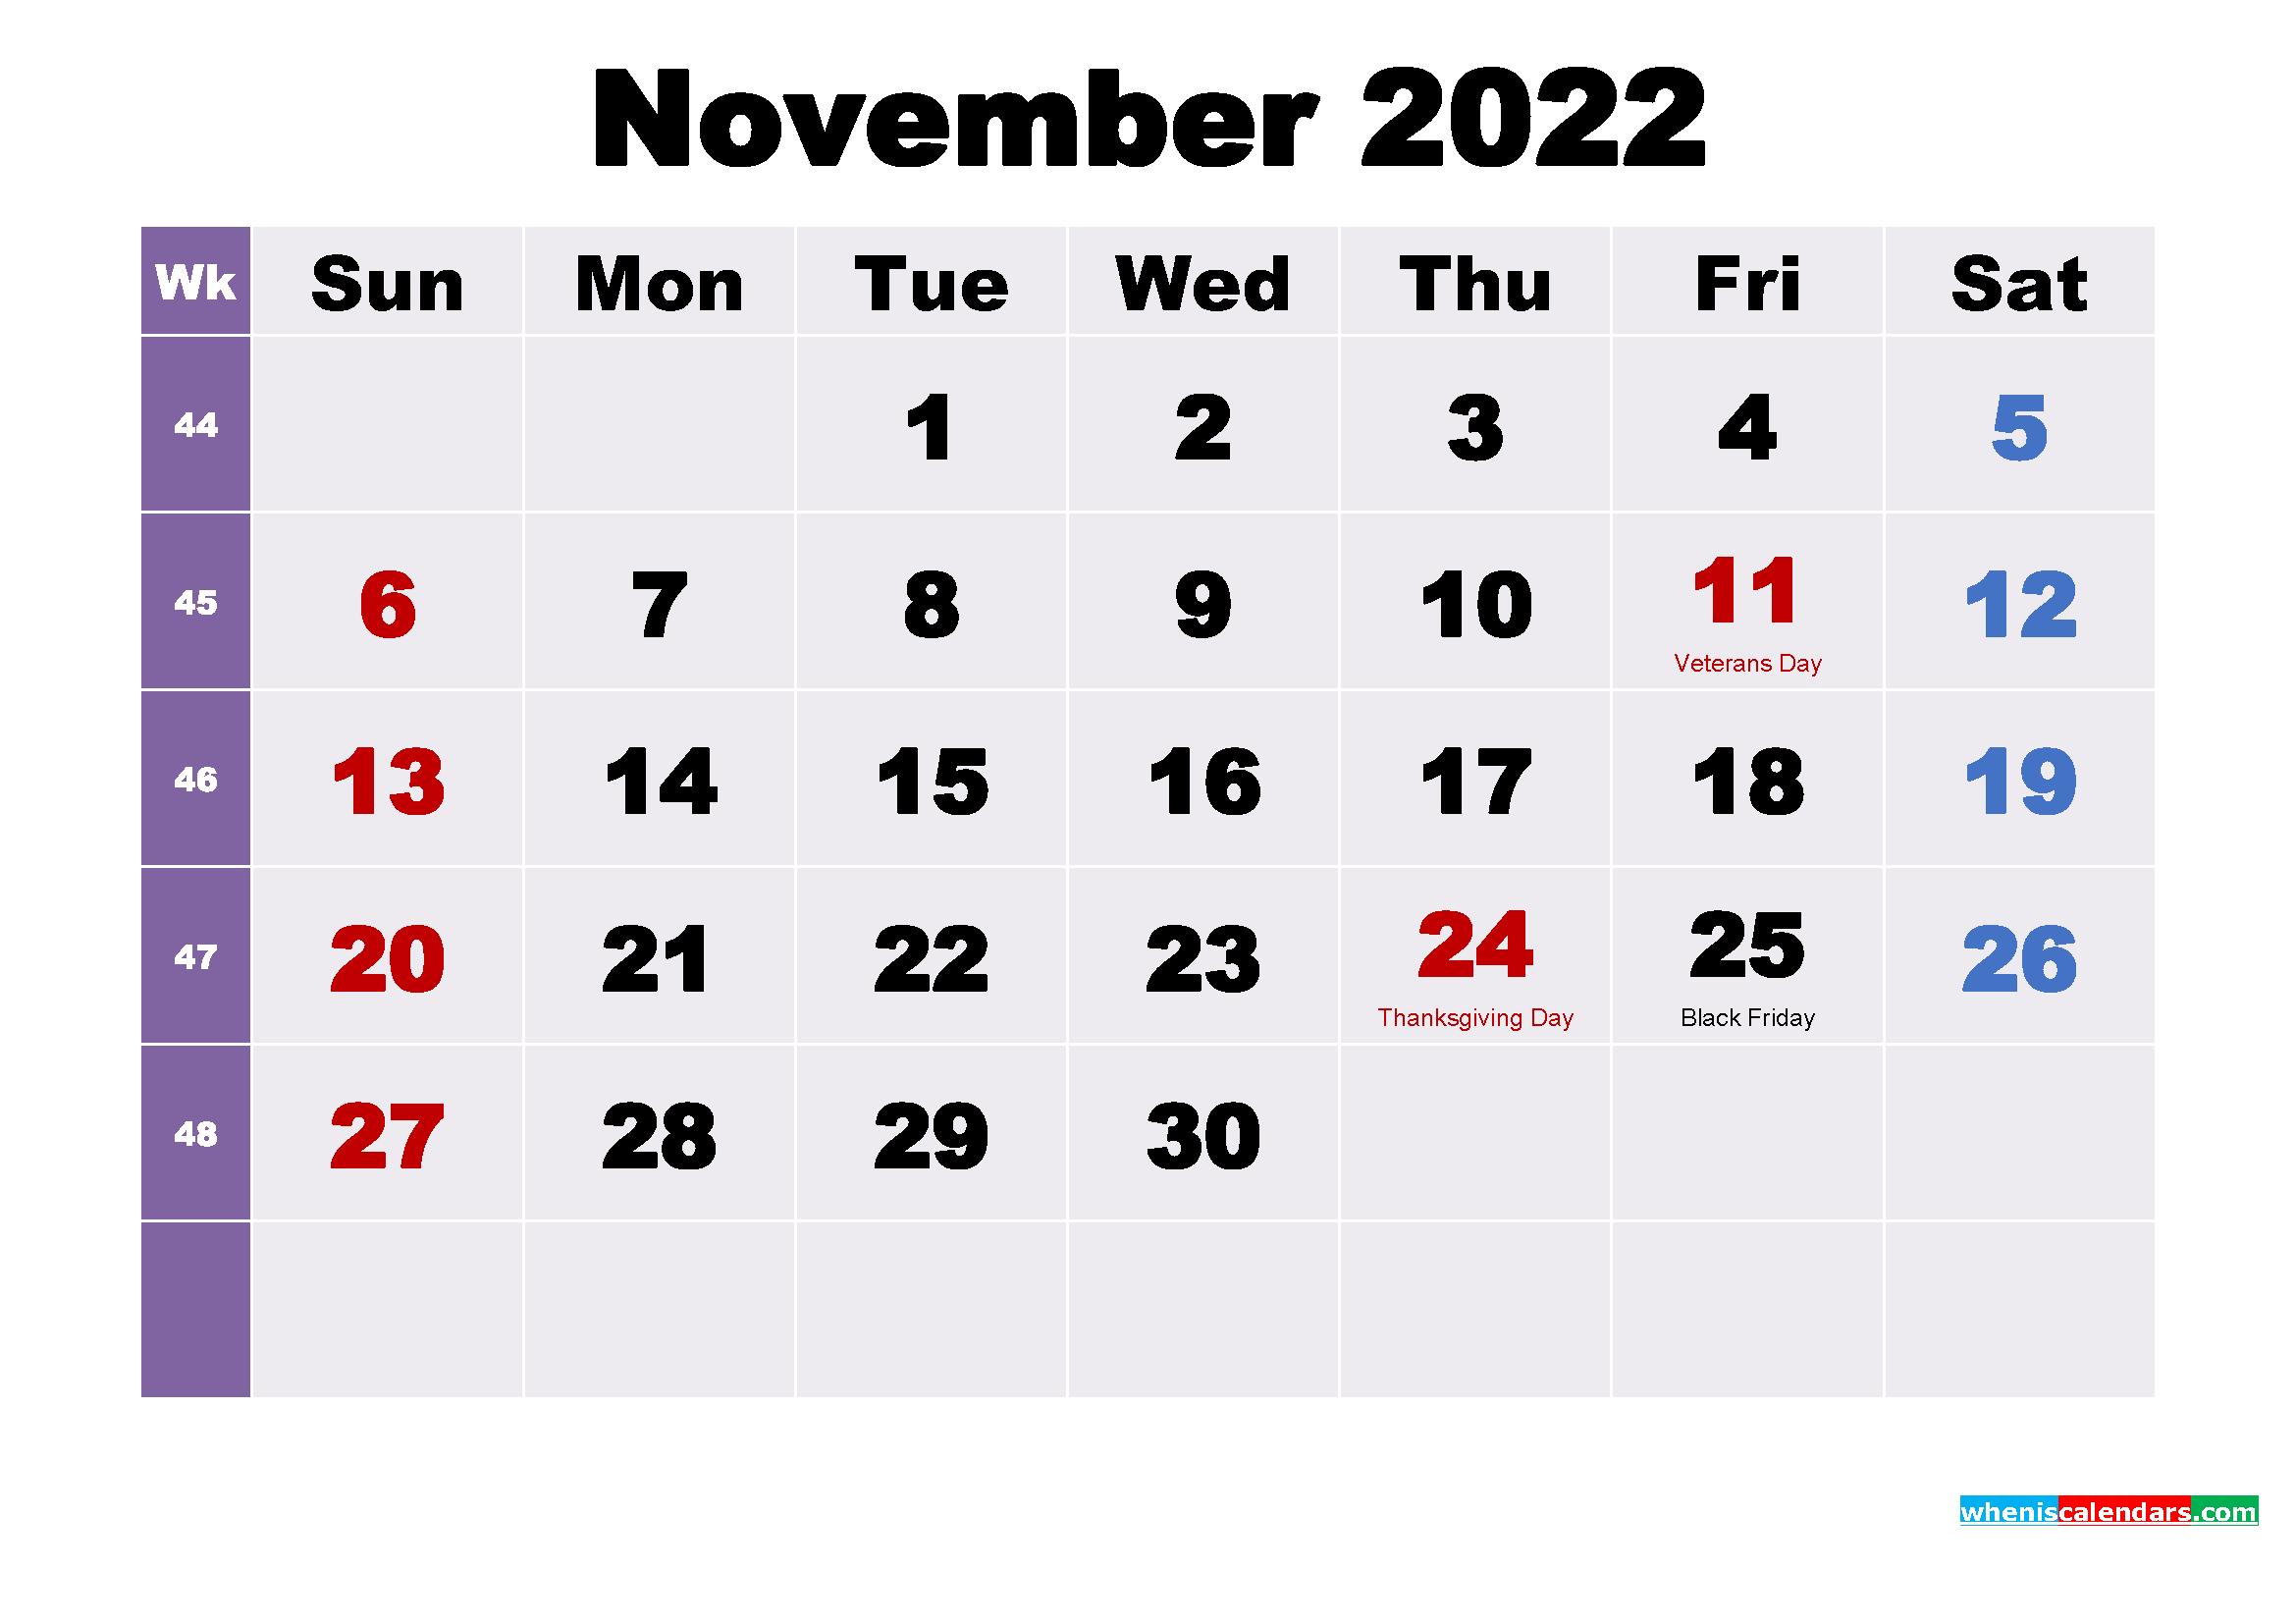 Printable November 2022 Calendar.November 2022 Desktop Calendar Free Download Free Printable 2021 Monthly Calendar With Holidays